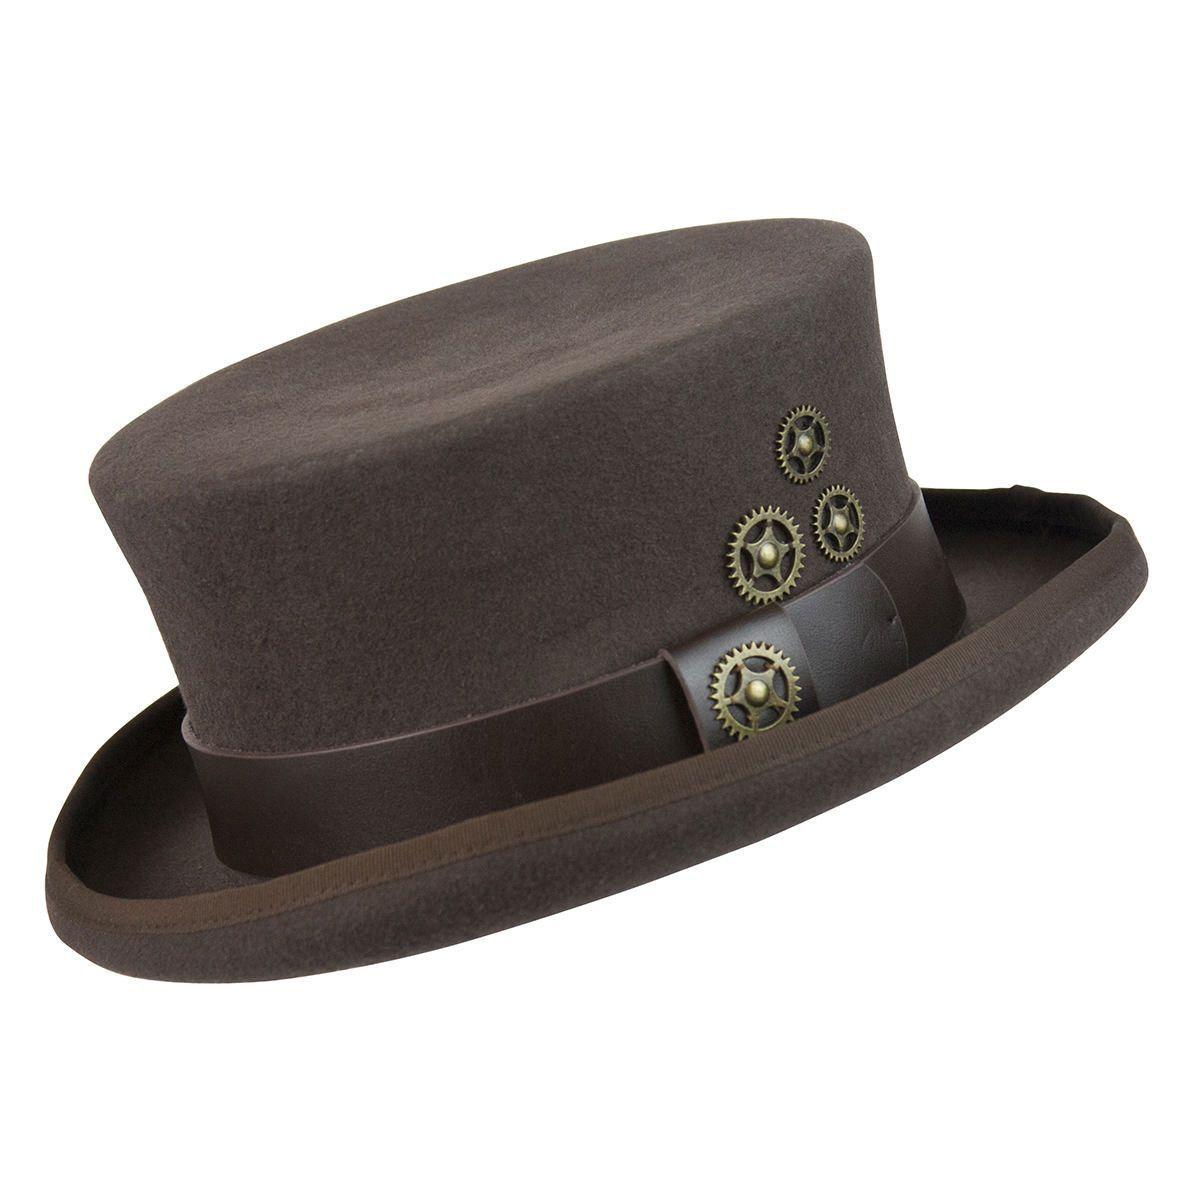 f80fa84d0a72 Time Travel Steampunk Top Hat | Steampunk Hats | Steampunk top hat ...